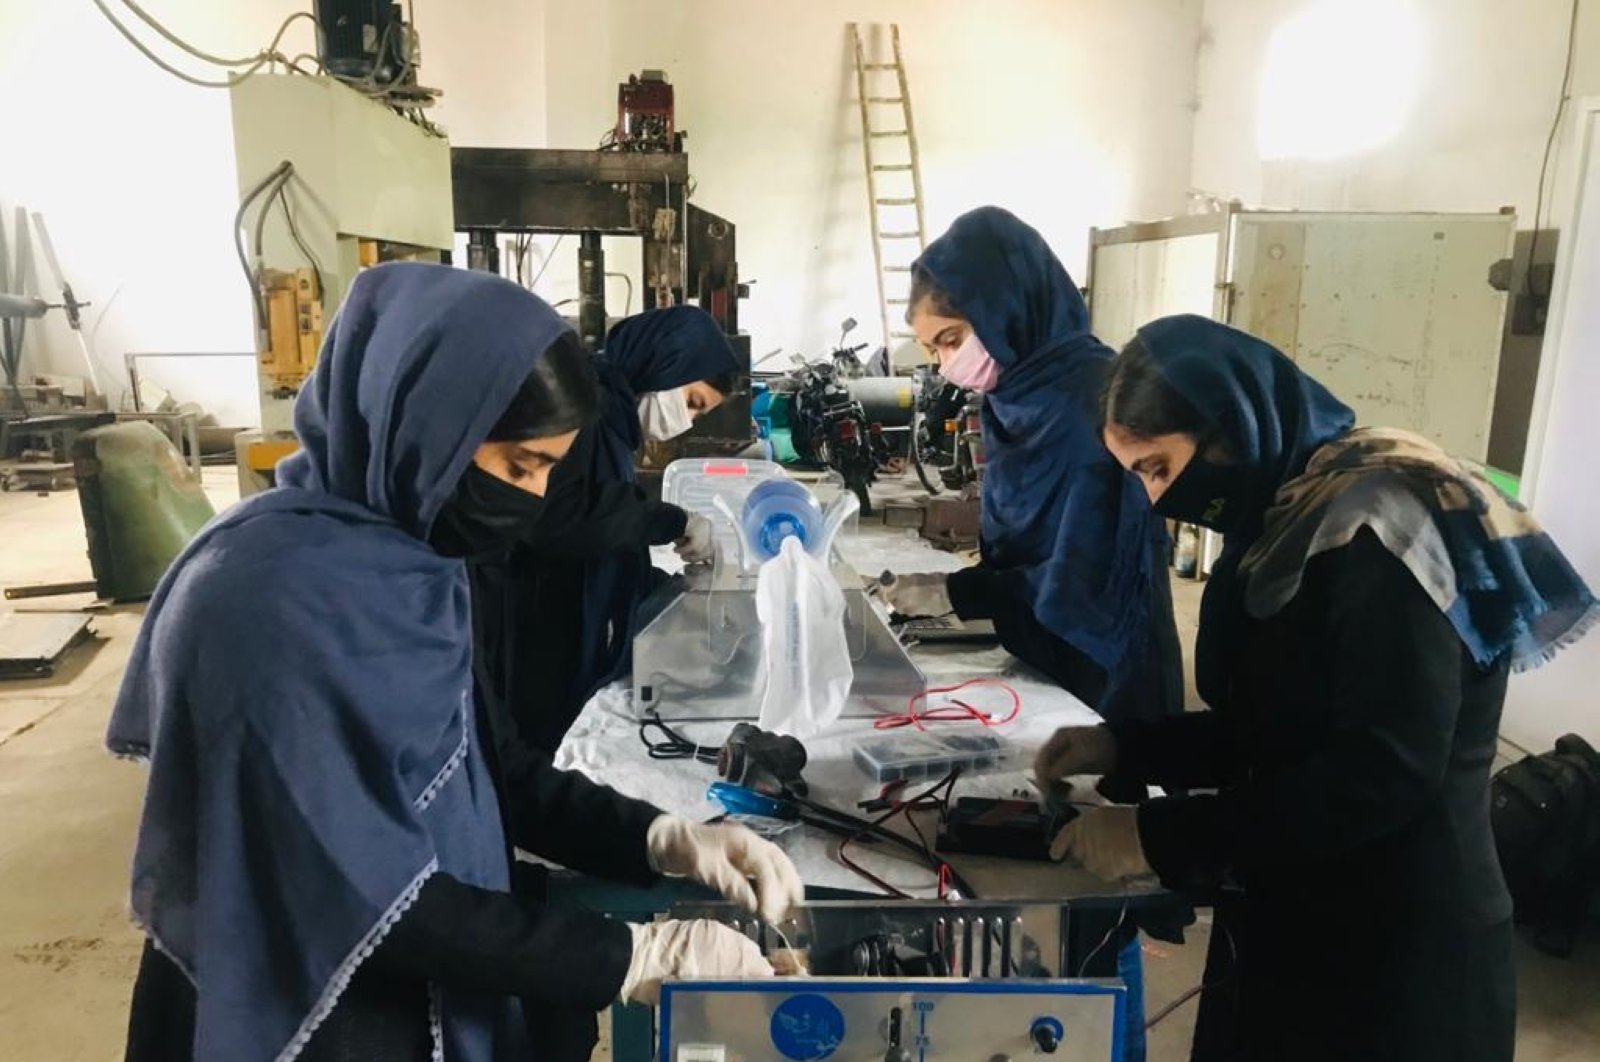 The Afghan Robotics Team works on a prototype breathing machine, Herat, Afghanistan, May 25, 2020. (Thomson Reuters Foundation/courtesy of Somaya Faruqi)